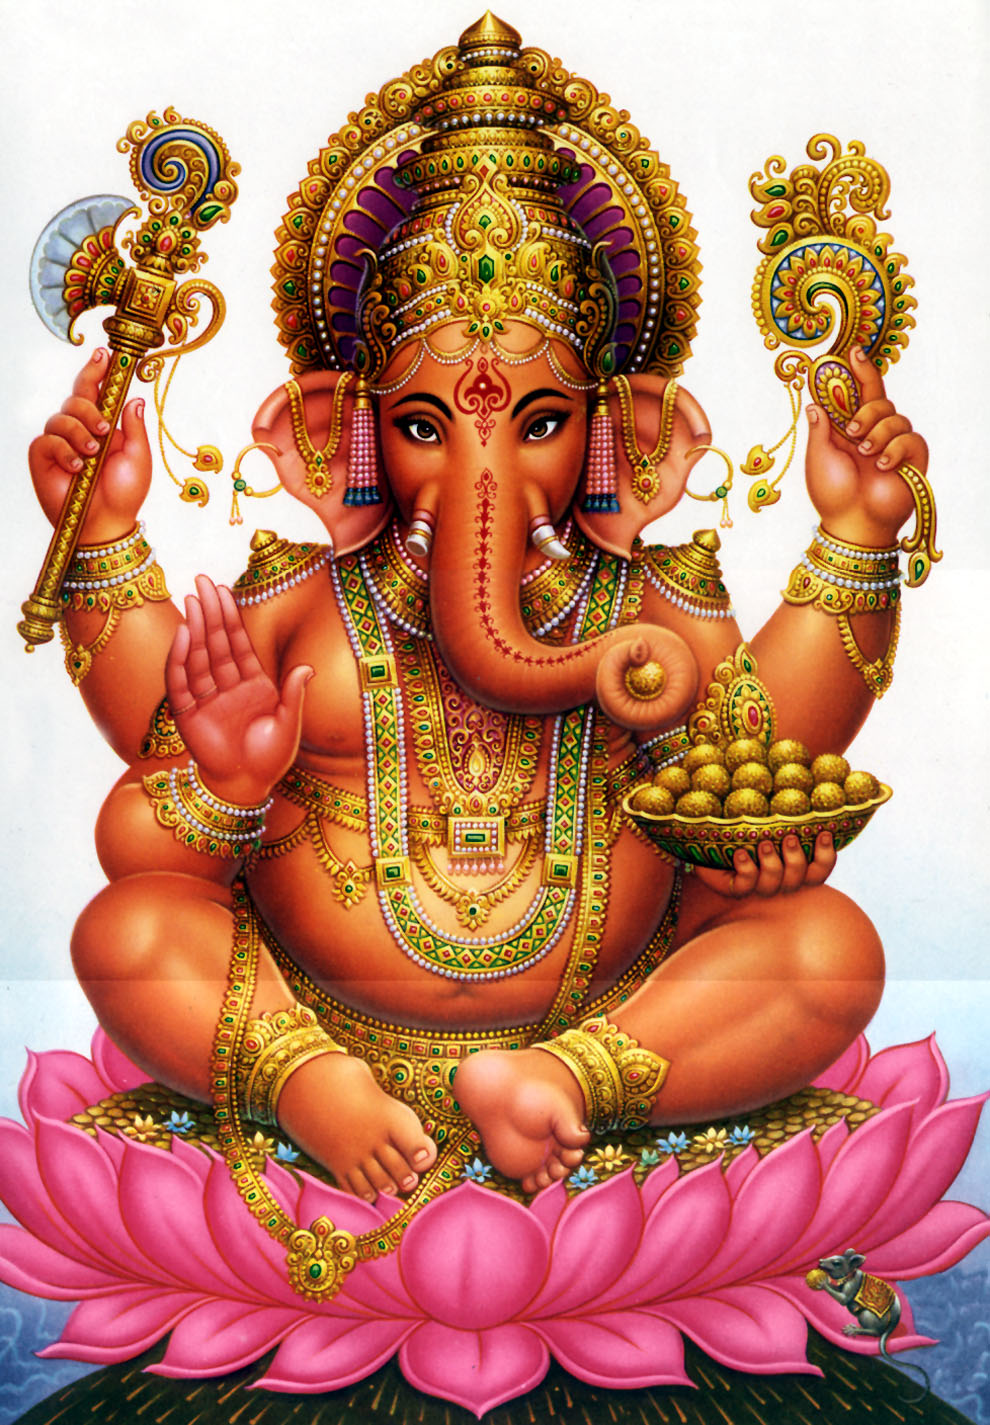 Bhagwan ji help me lord shri ganesh latest hd wallpapers gallery - Sri ganesh wallpaper hd ...